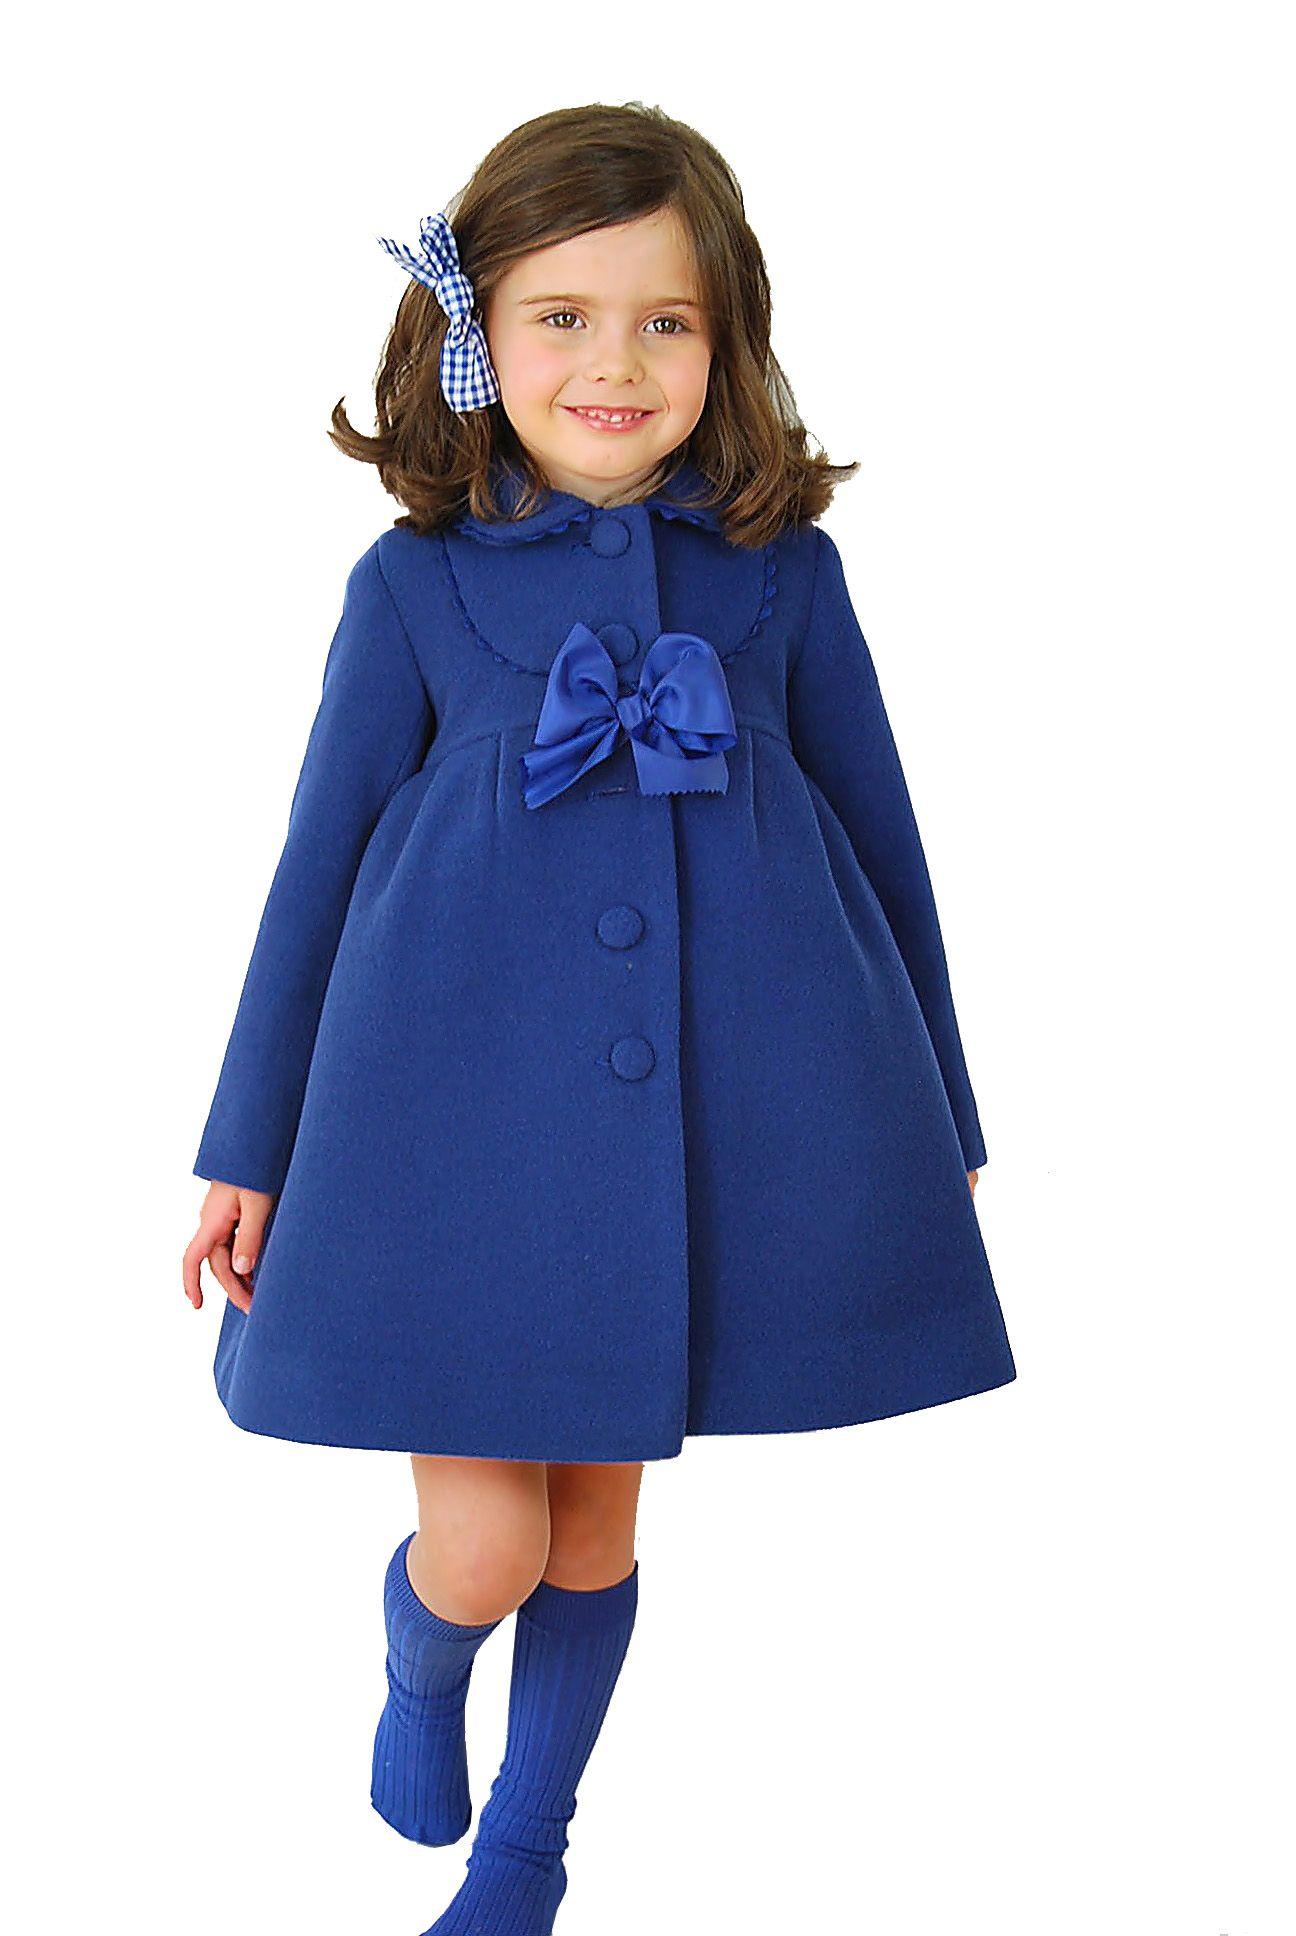 Abrigo azulon ropa de niña pinterest lelutlapsille ja lapset